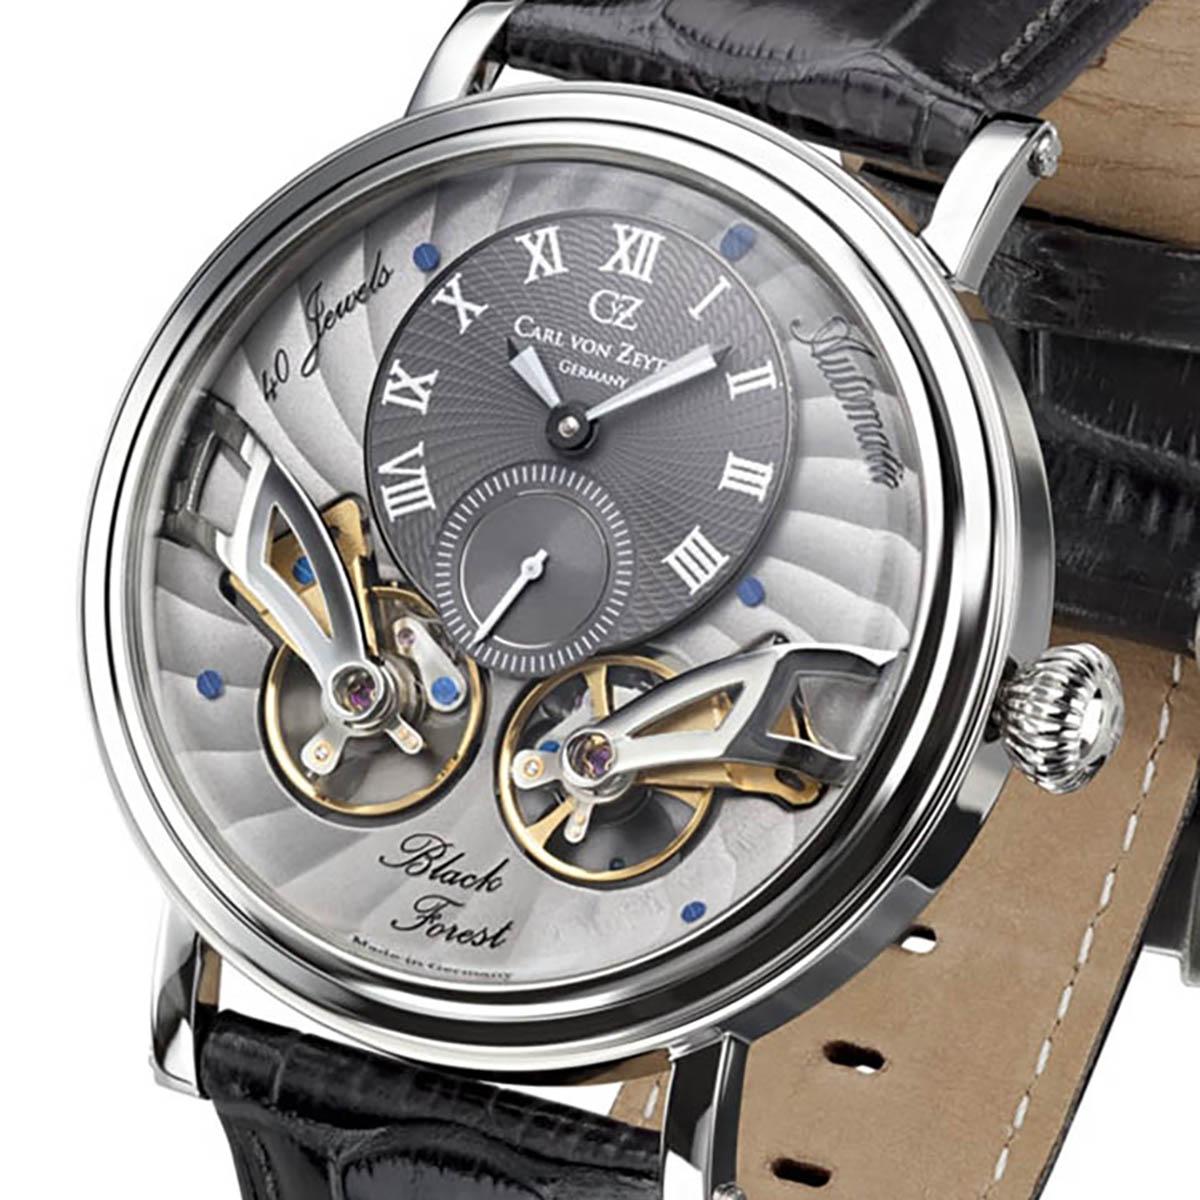 Carl von Zeyten カール・フォン・ツォイテン 自動巻き(手巻き機能あり) 腕時計 [CvZ0017SGY] 正規品 スケルトン ダブルテンプ